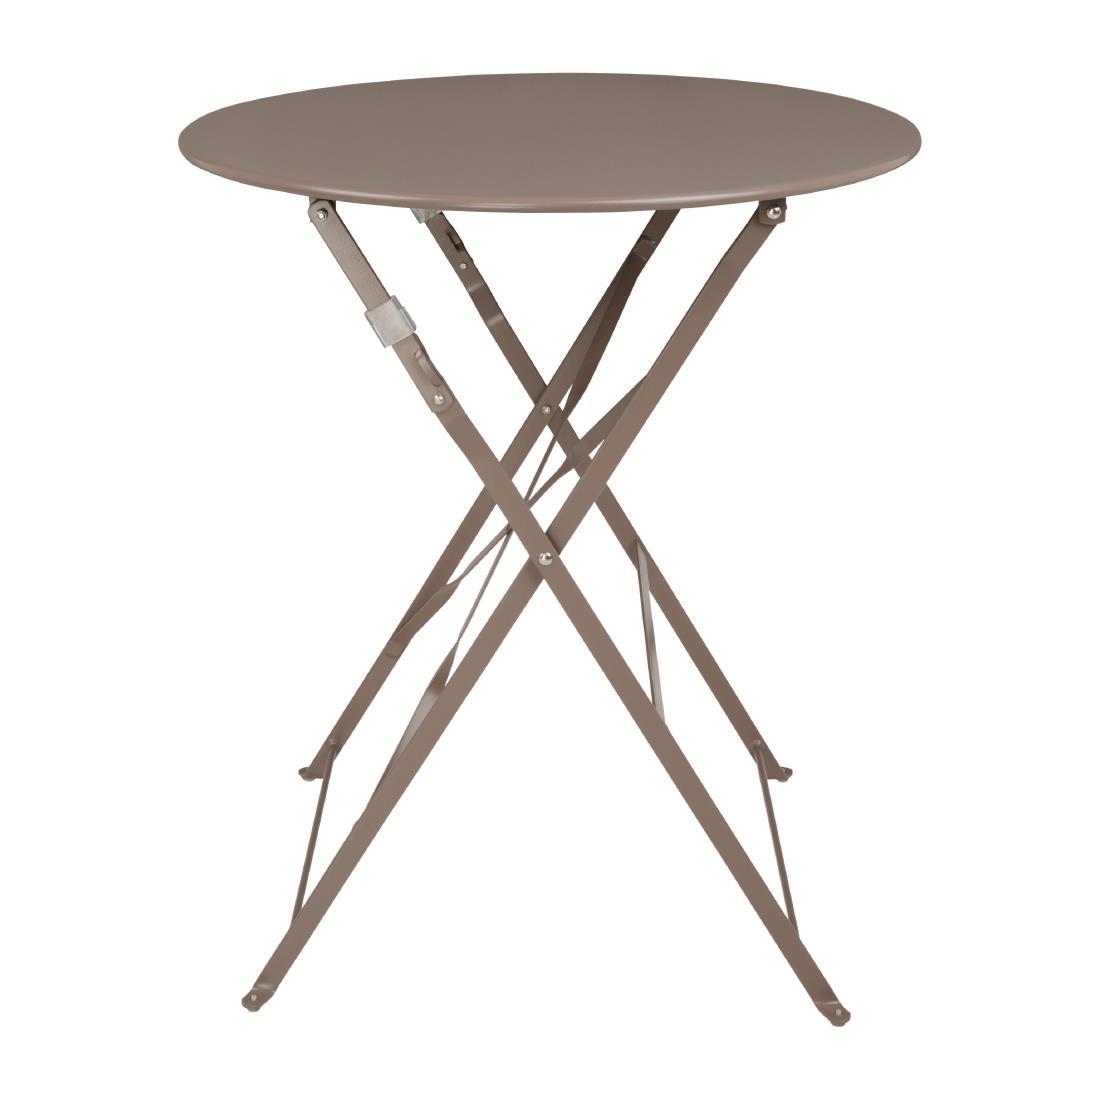 Steel Folding Table Round - Coffee